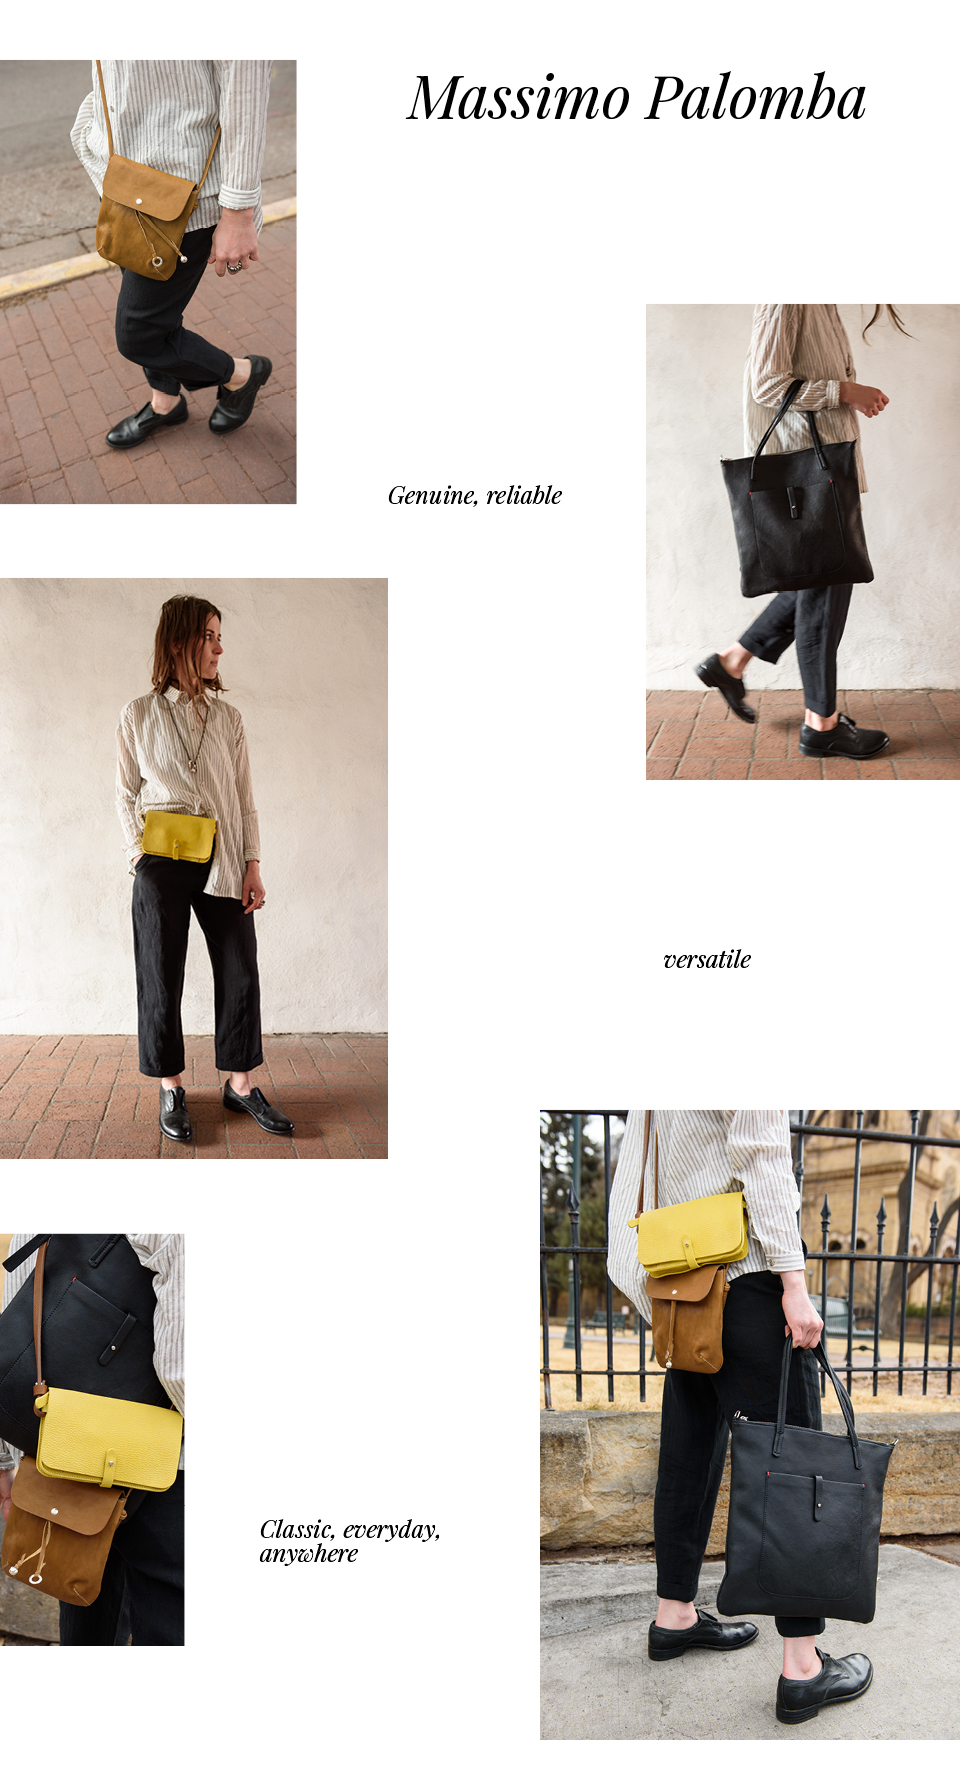 massimo-palomba-spring-summer-2018-bag-collection